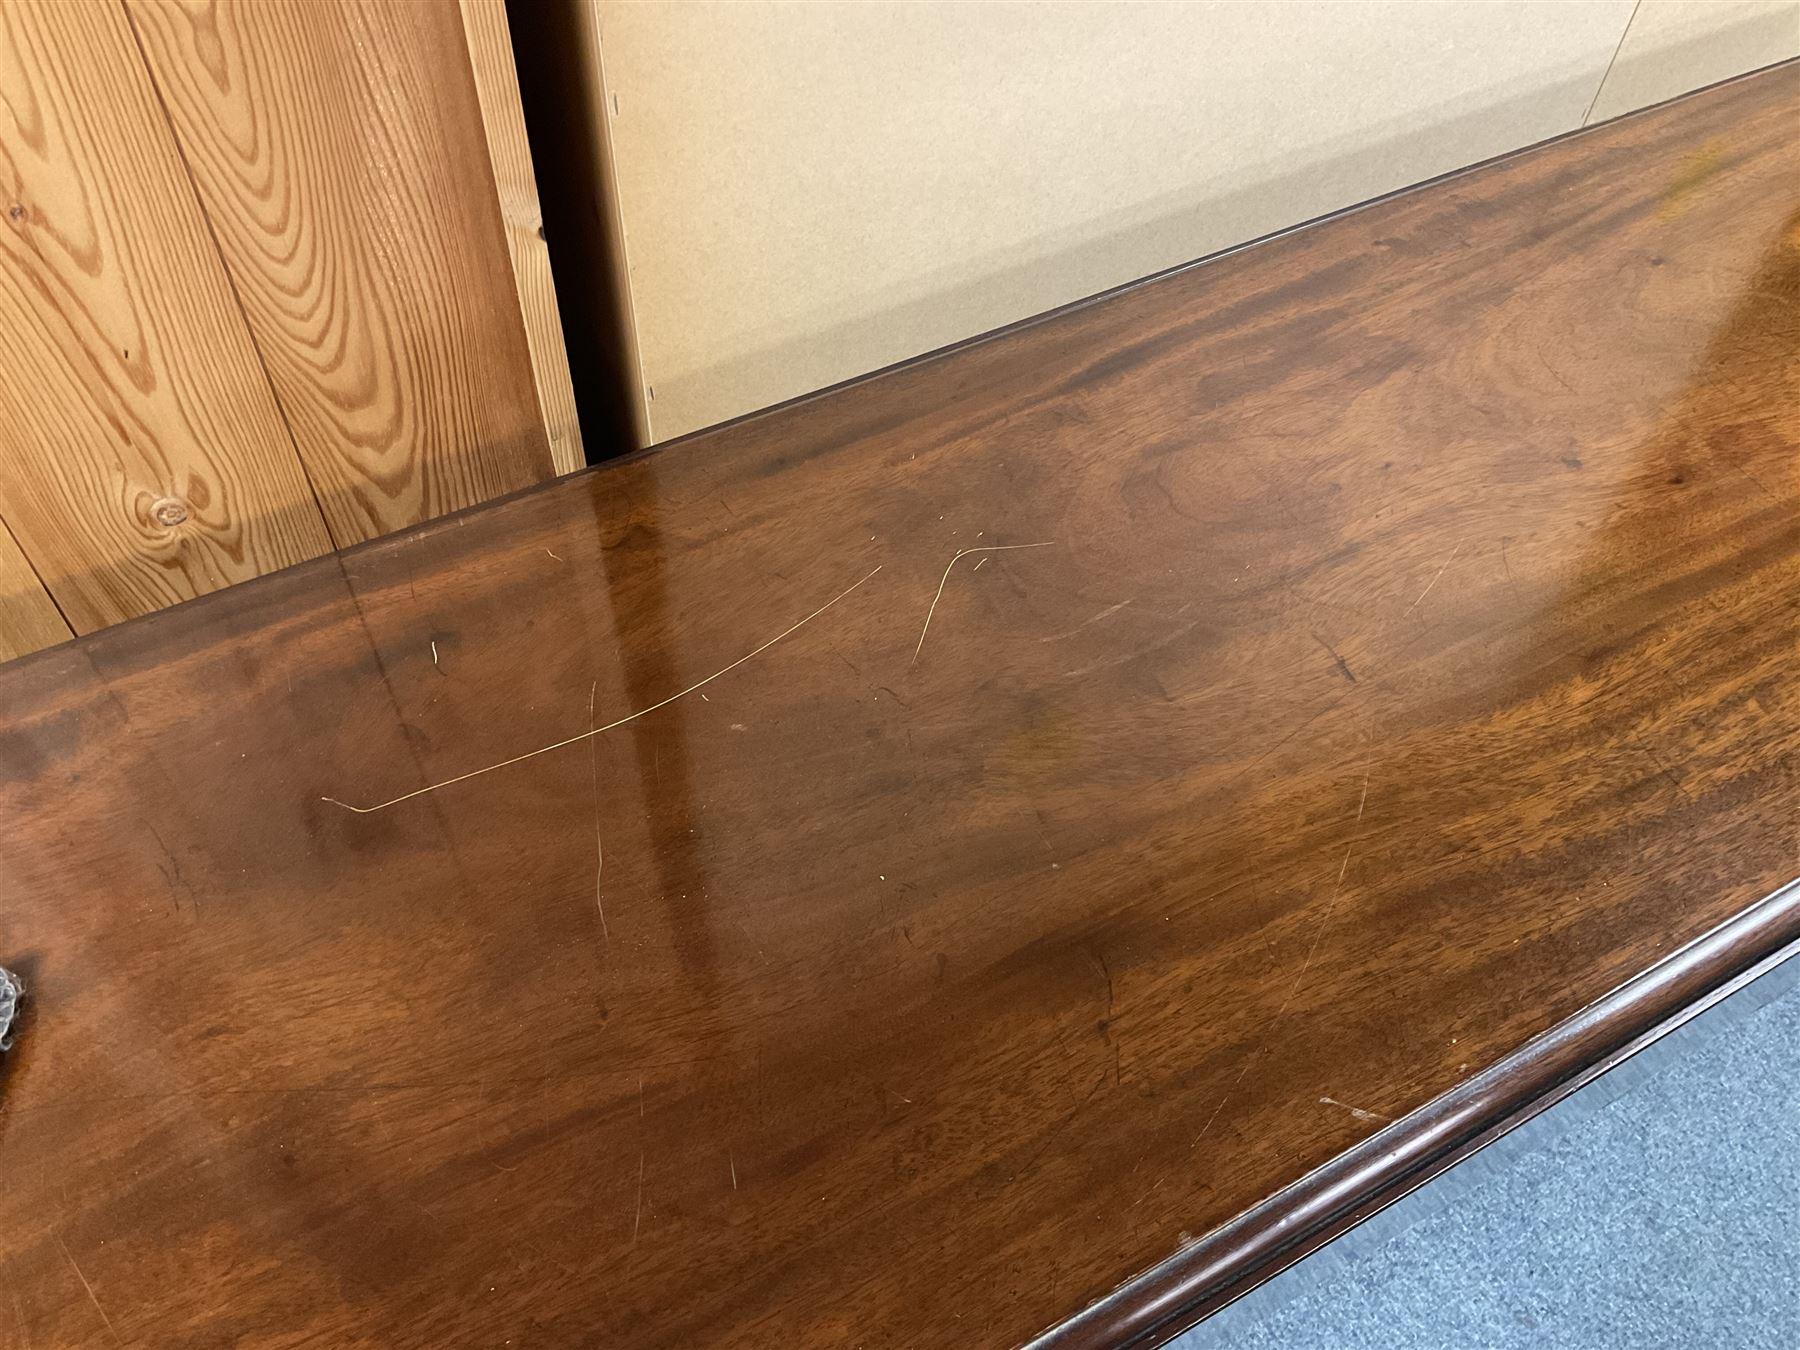 20th century Georgian style mahogany wake table - Image 3 of 3